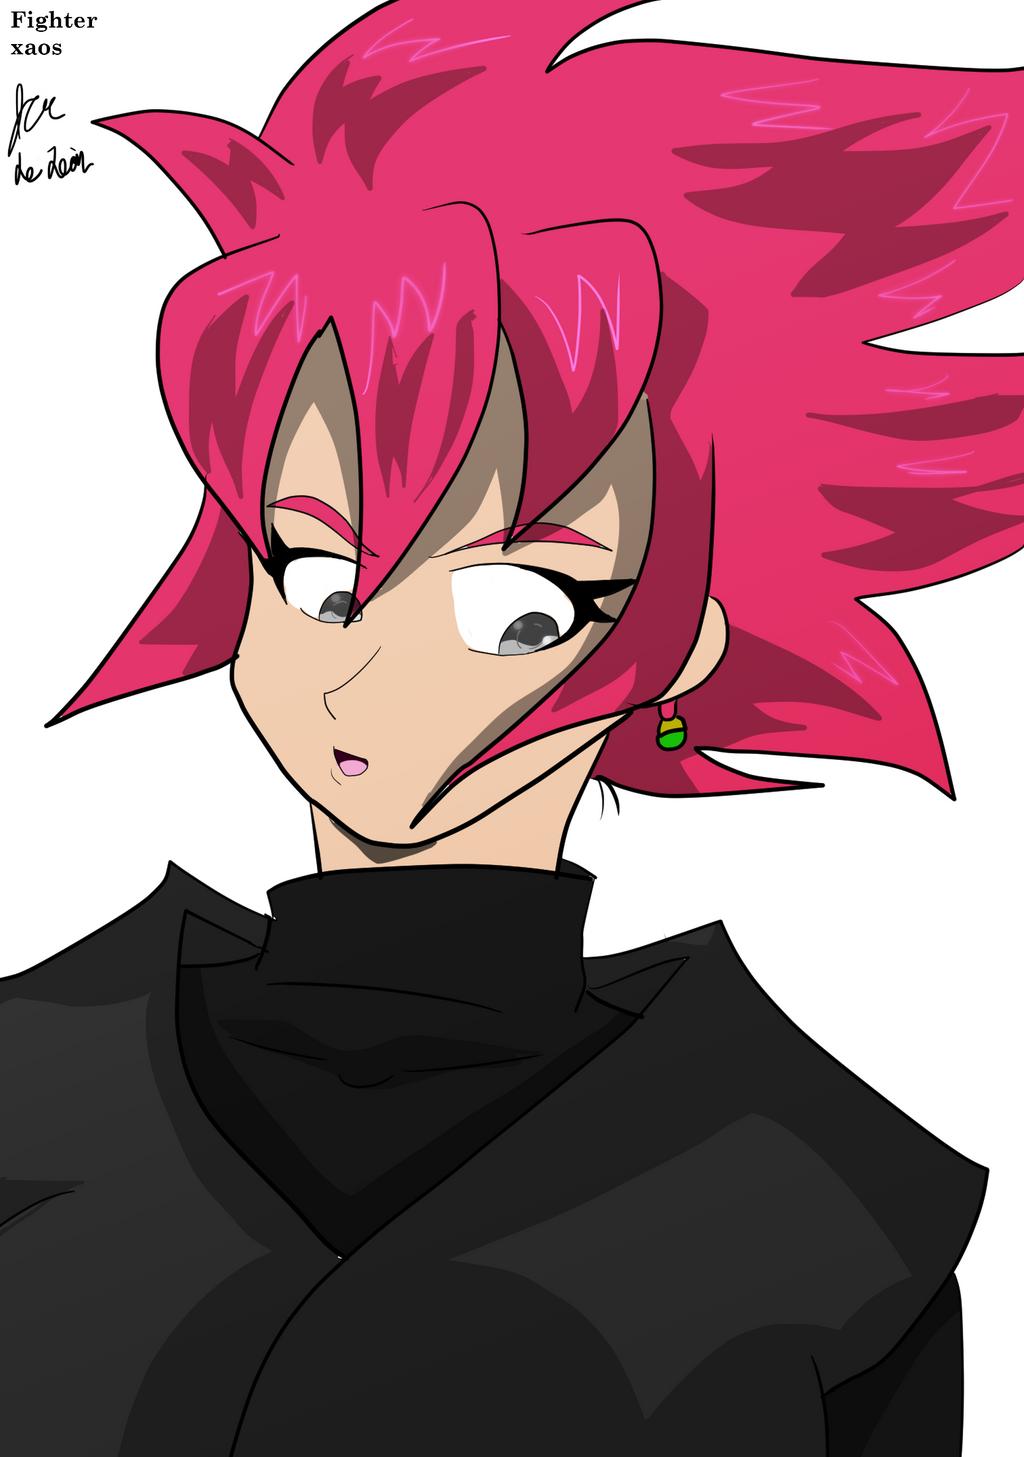 Femme goku black by fighterxaos on deviantart - Femme chat manga ...